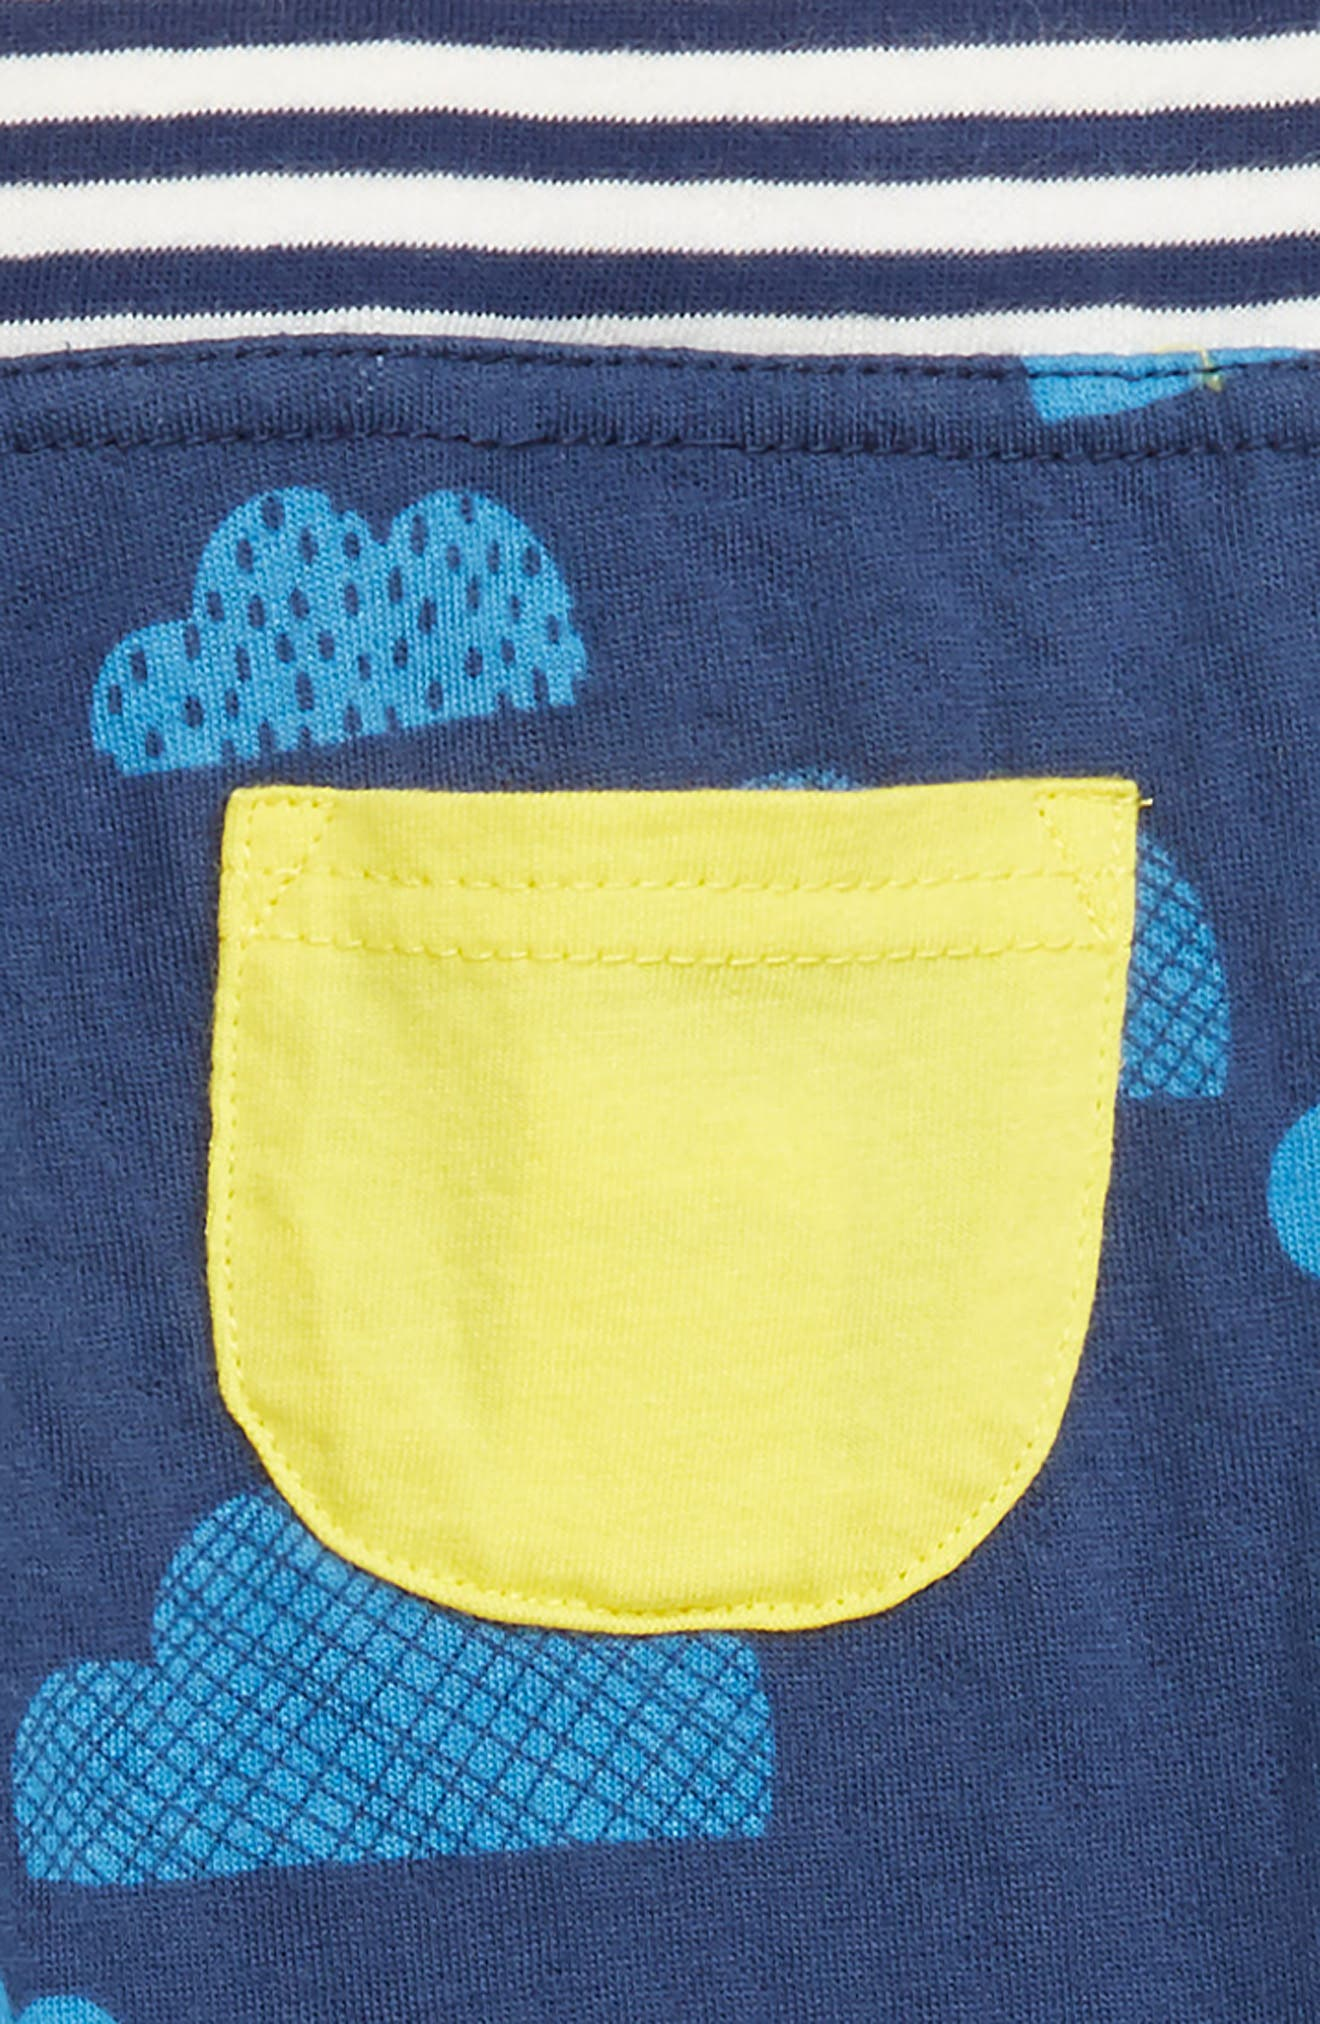 Reversible Print Pants,                             Alternate thumbnail 3, color,                             NAV COLLEGE BLUE CLOUDS